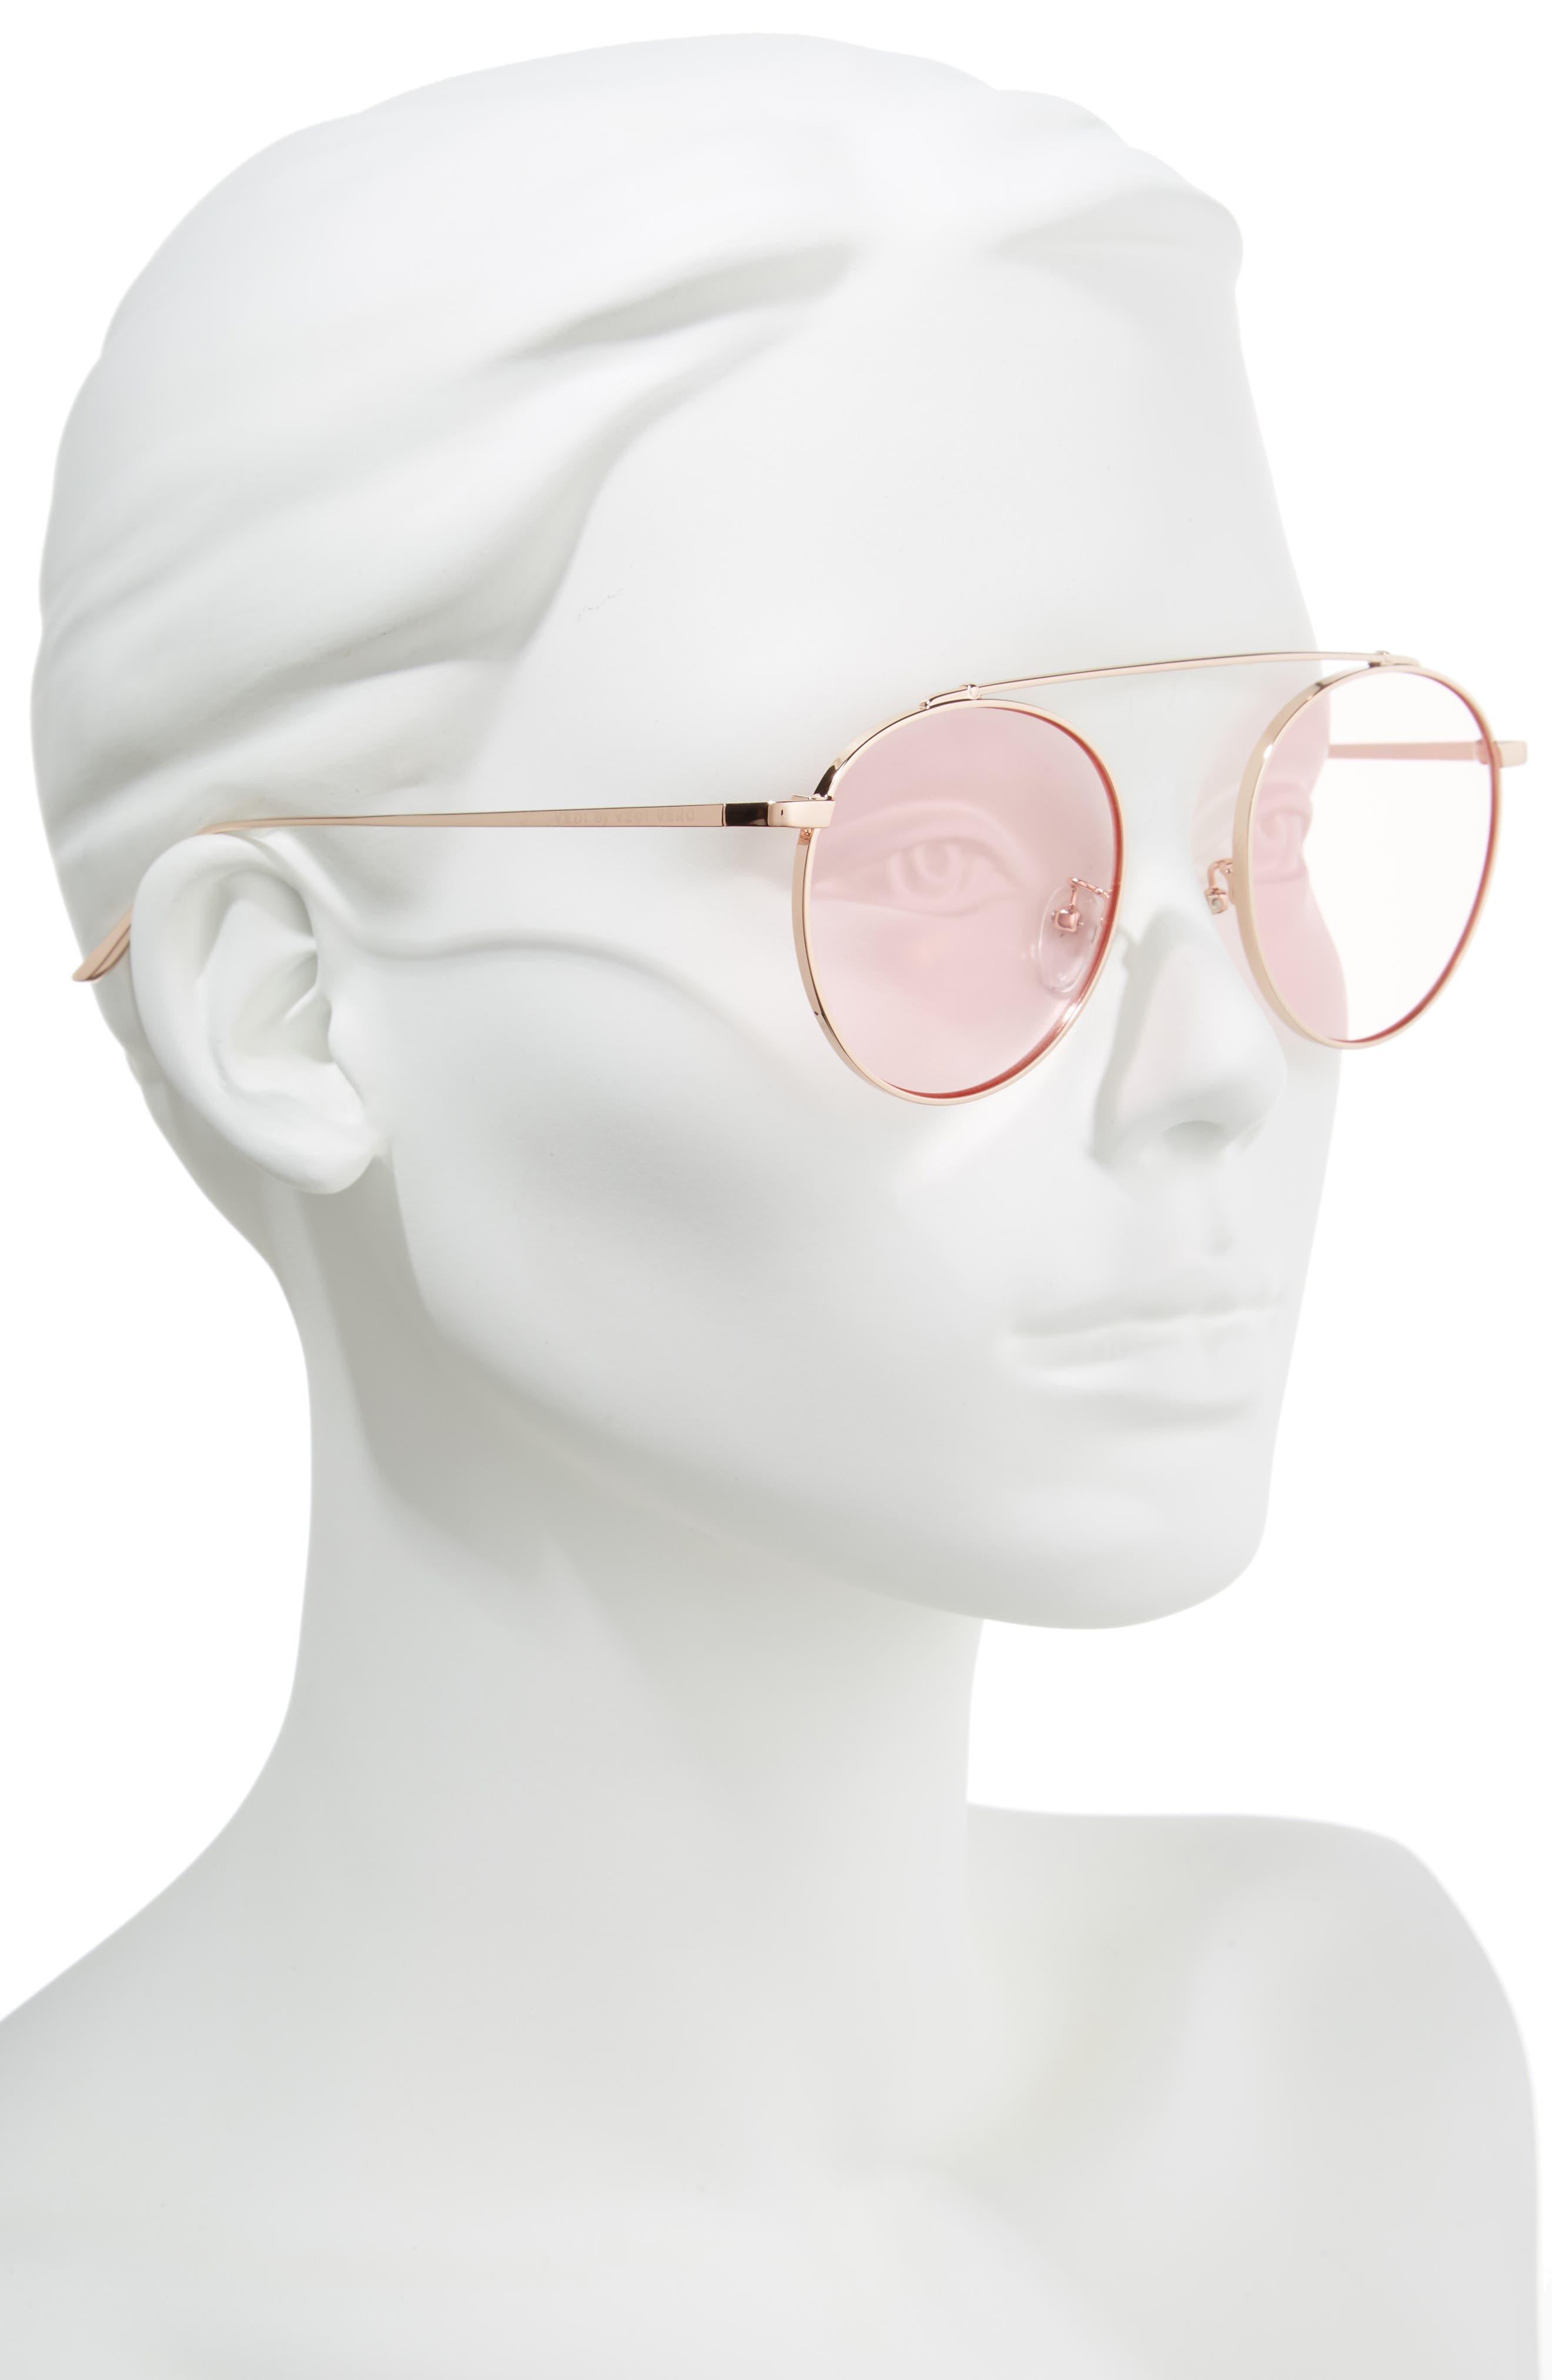 VEDI VERO,                             53mm Round Sunglasses,                             Alternate thumbnail 2, color,                             ROSEGLD/PINK